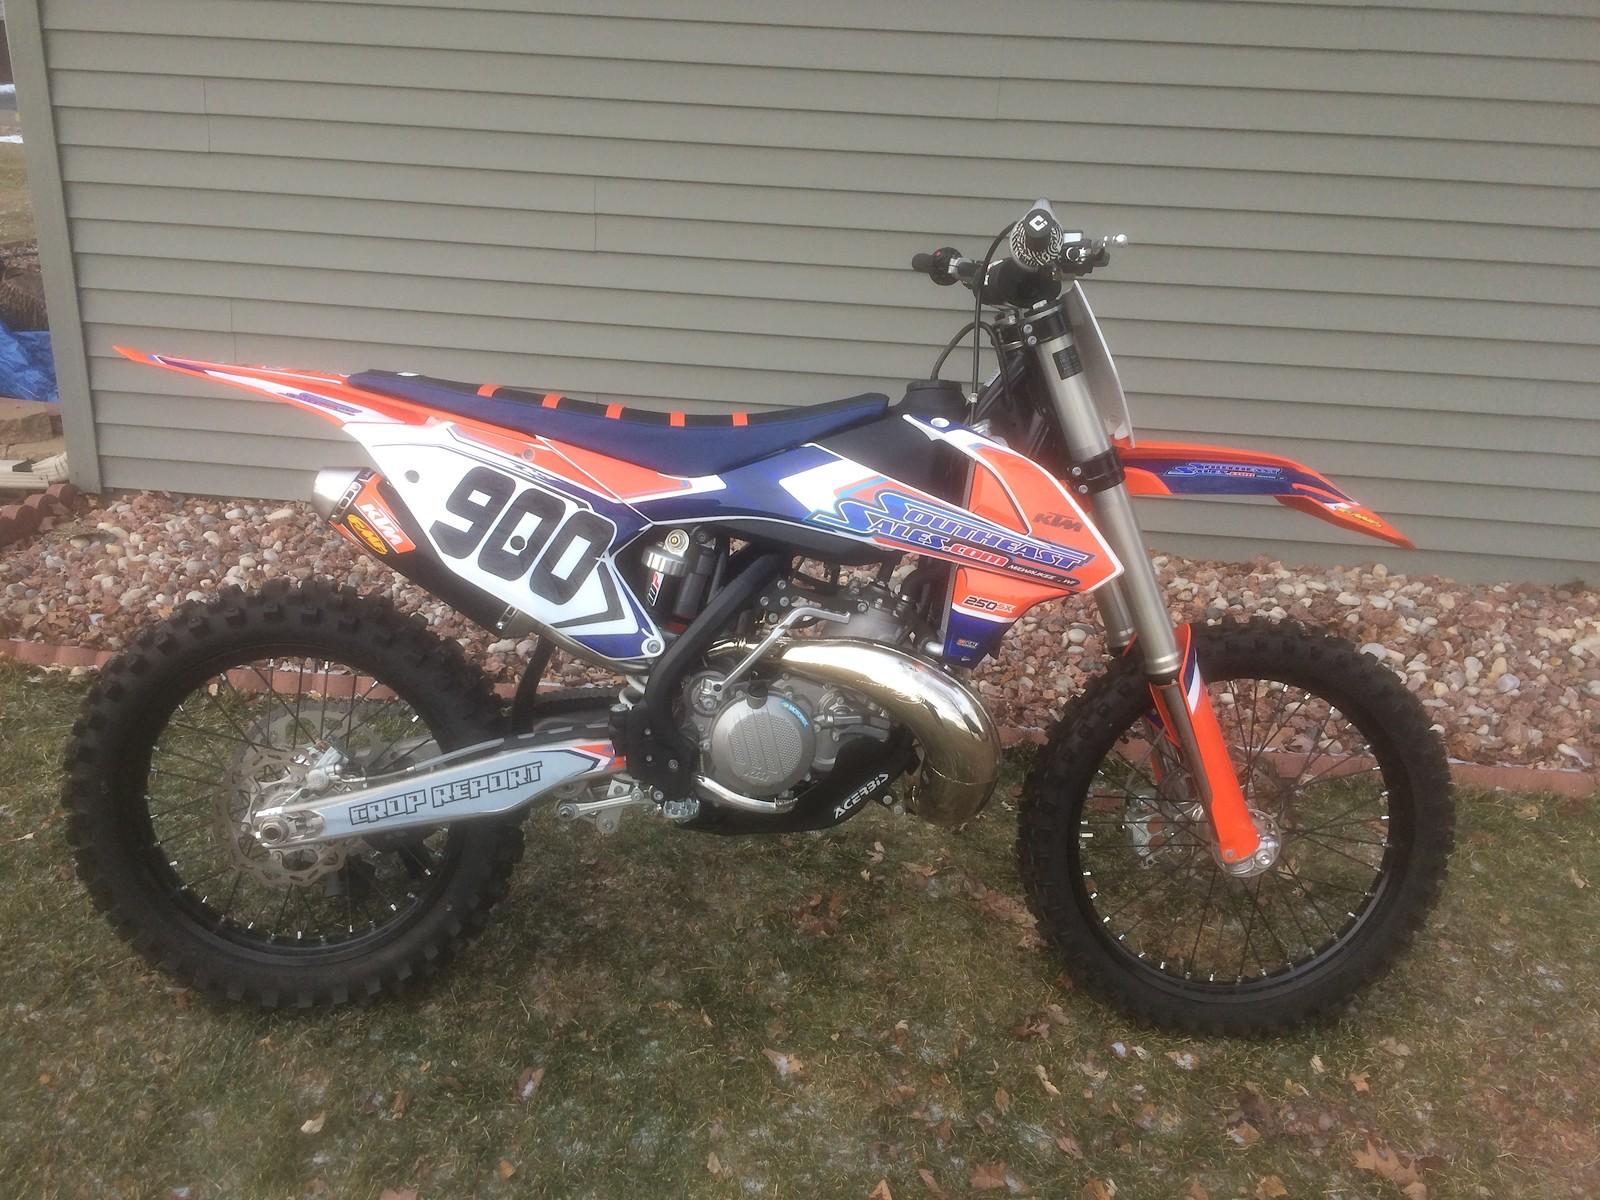 6625D0C6-61B7-4339-A615-6AE6764C41F5 - Jeremy_Jonas - Motocross Pictures - Vital MX